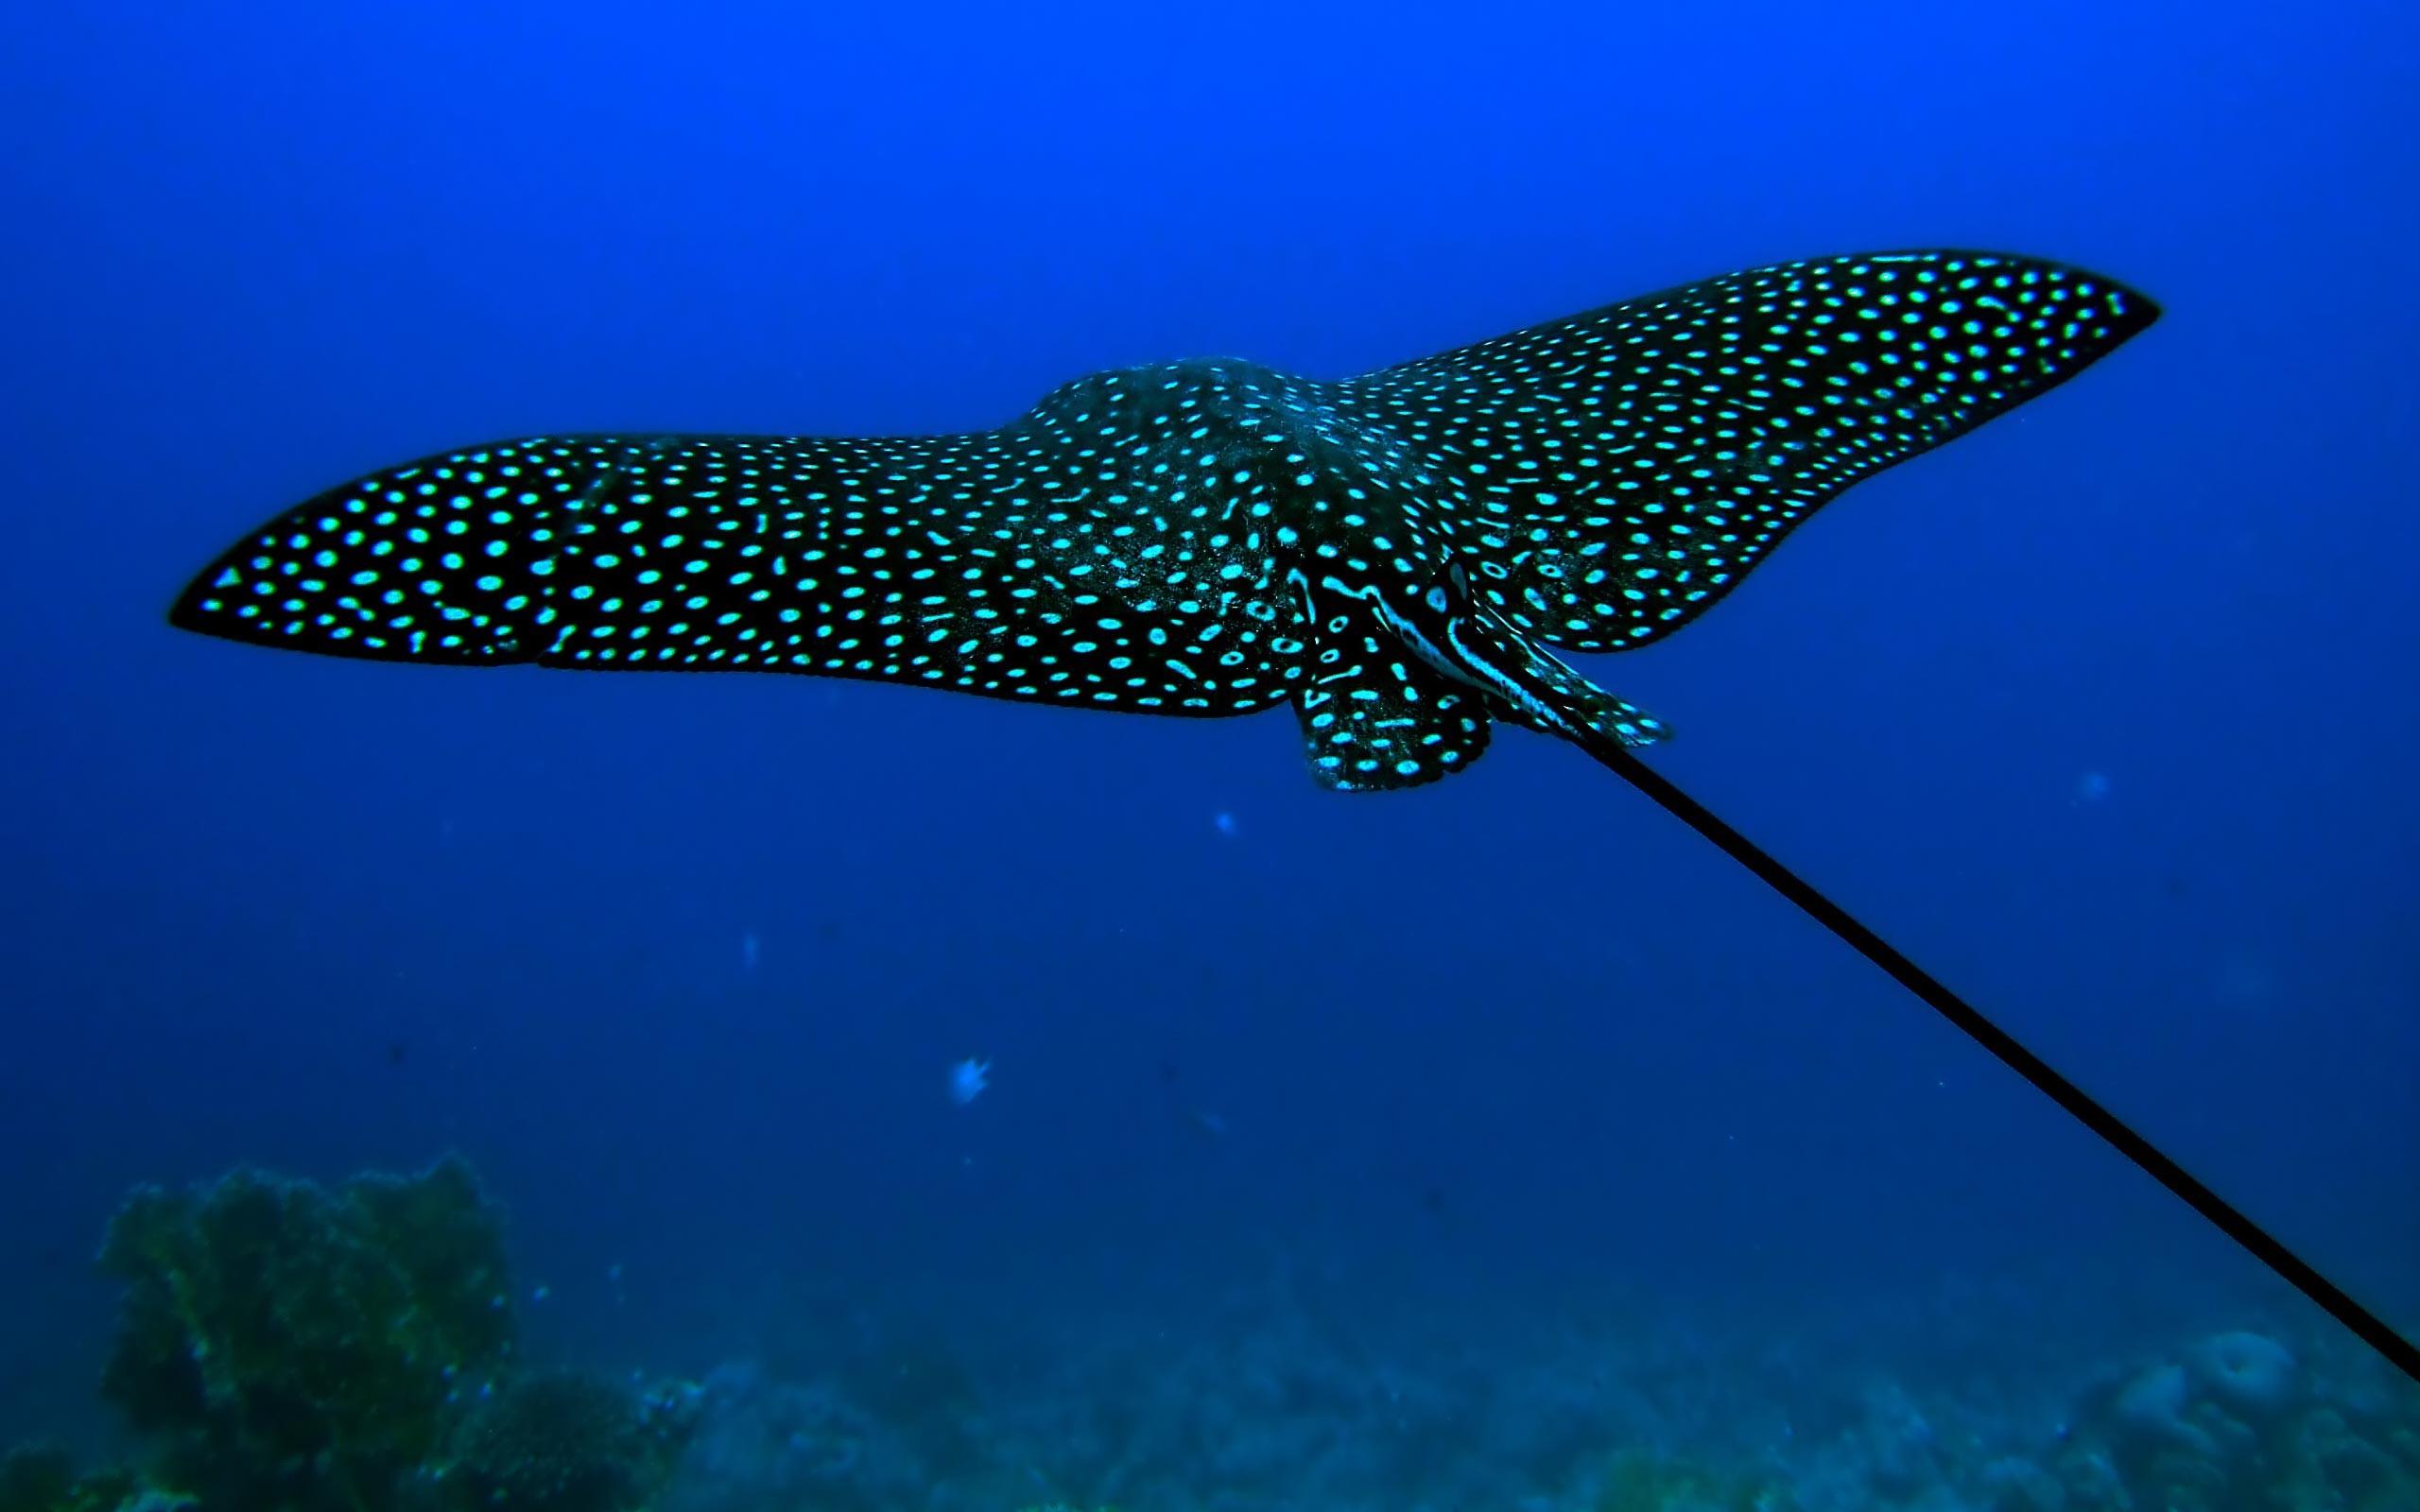 General 2560x1600 underwater animals Stingray